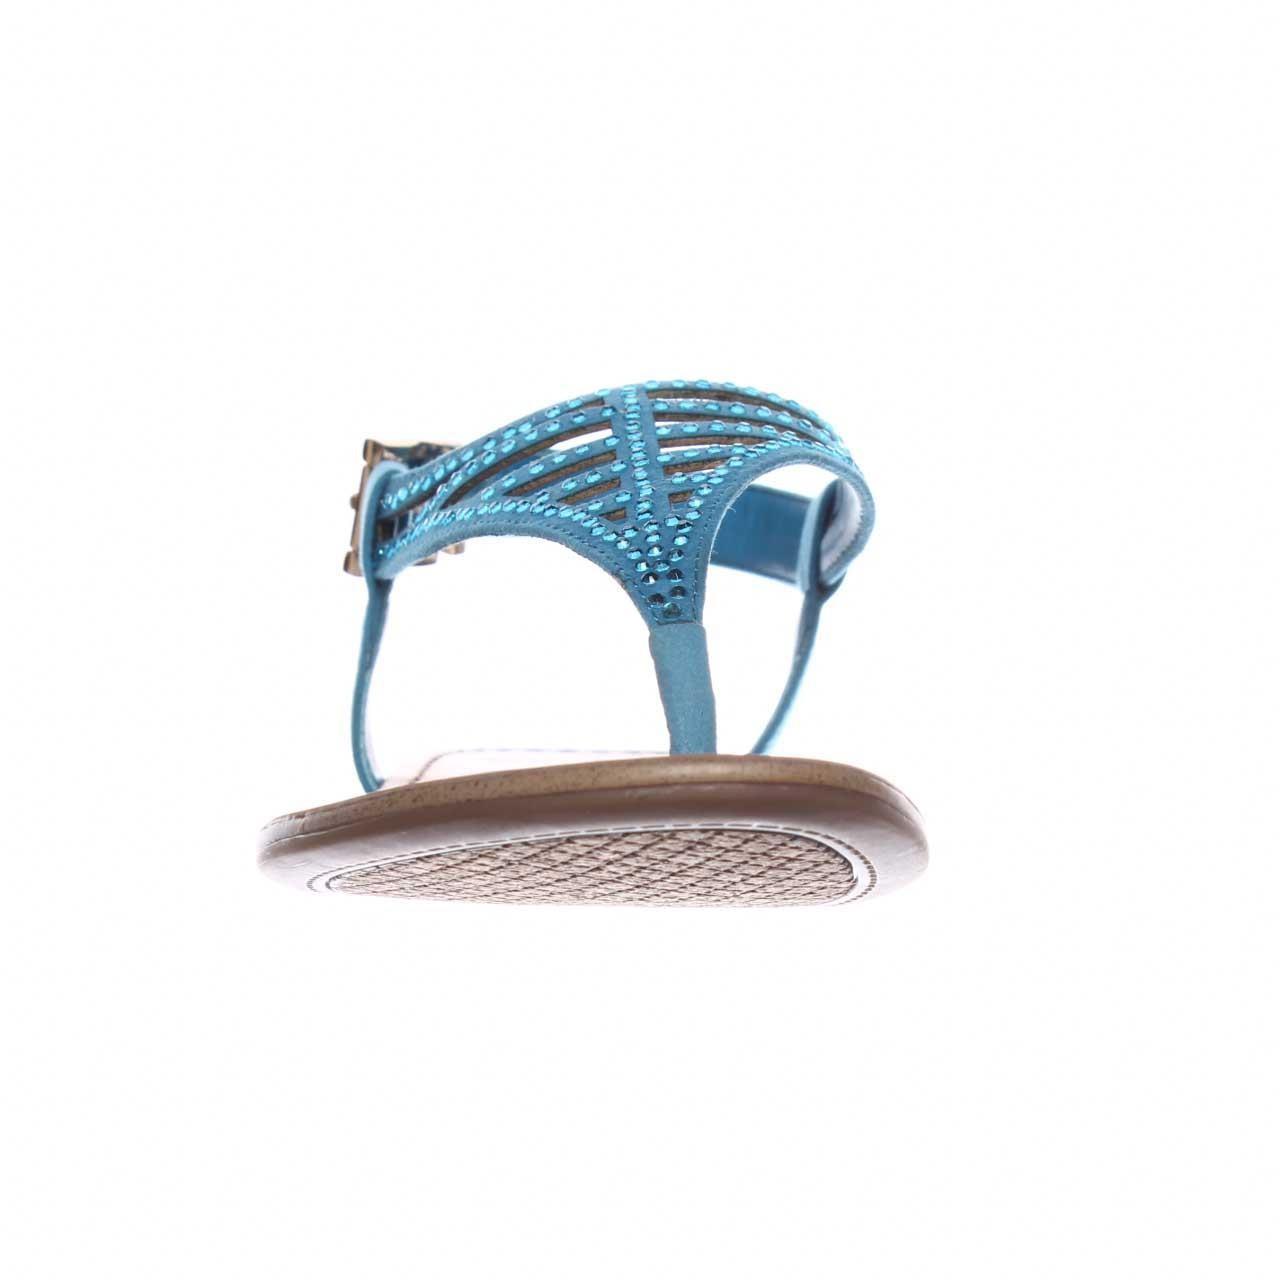 Jessica Simpson Electric Blue Shoes